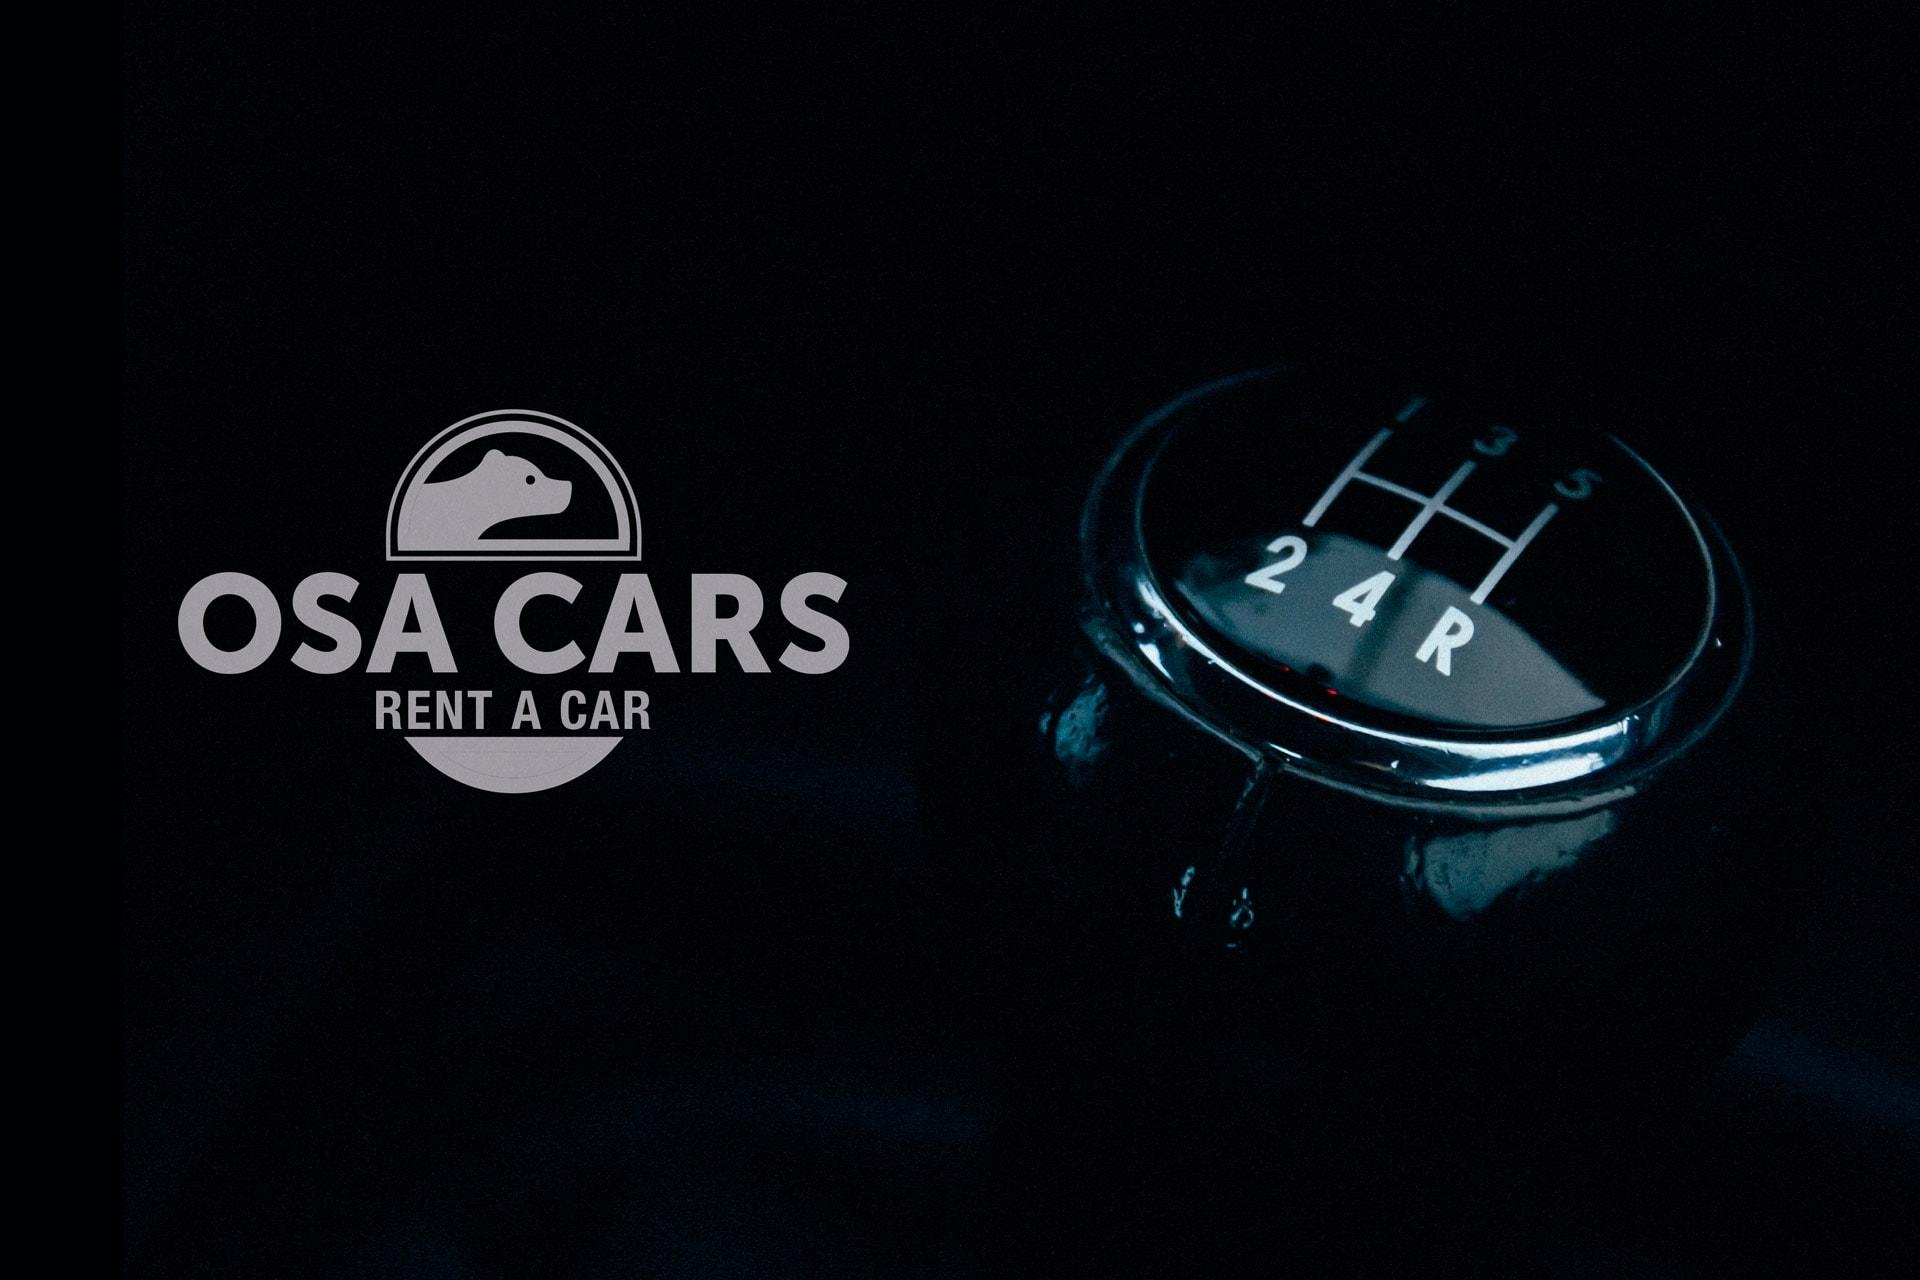 imagen marca Osa Cars